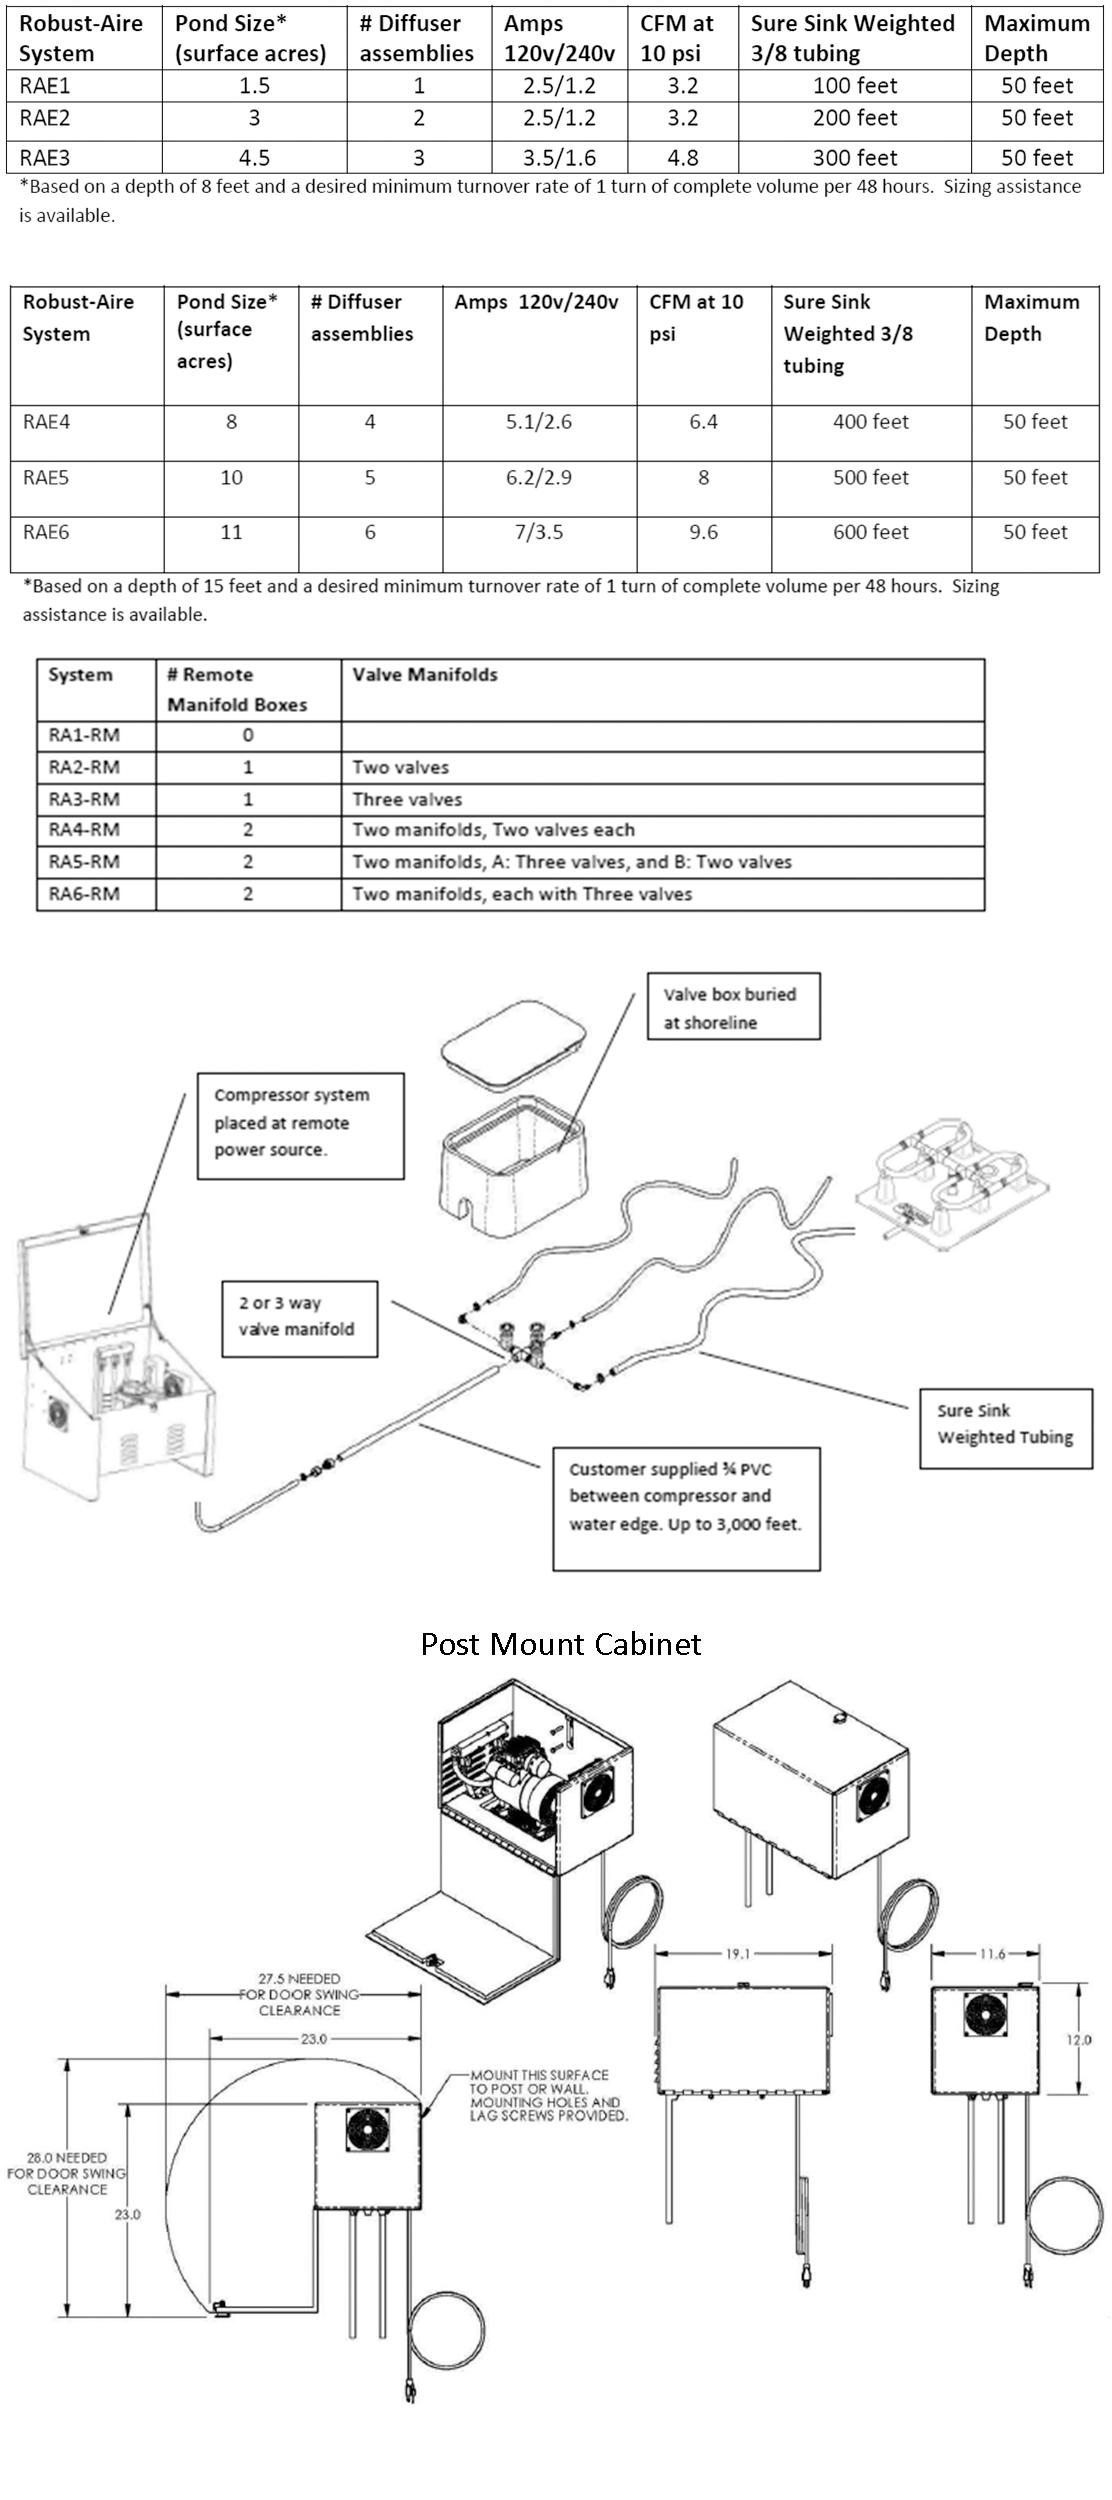 Robust-Aire Tech Sheet